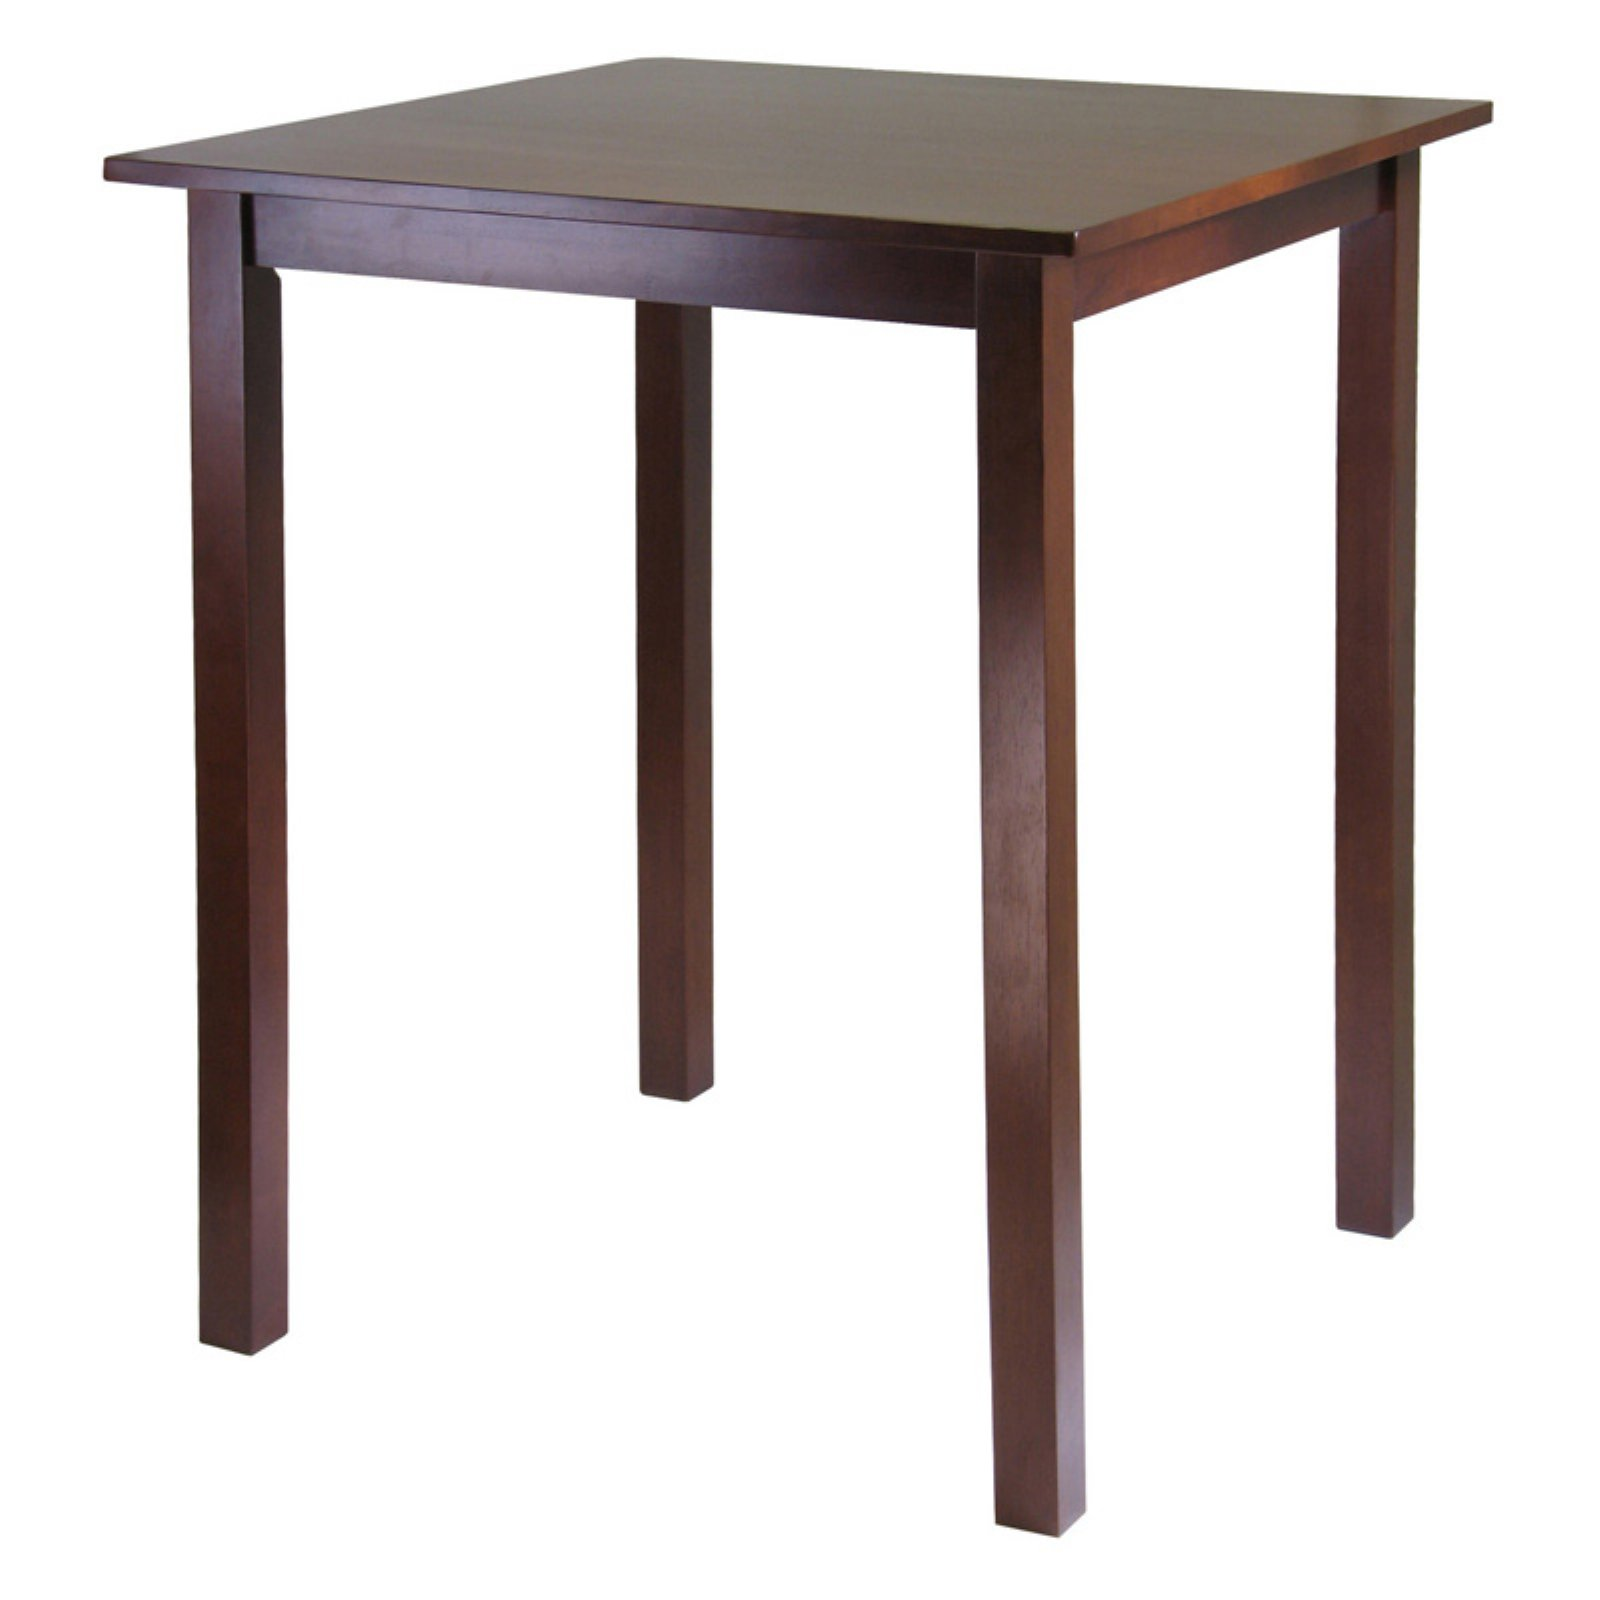 Parkland Square High Table, Antique Walnut